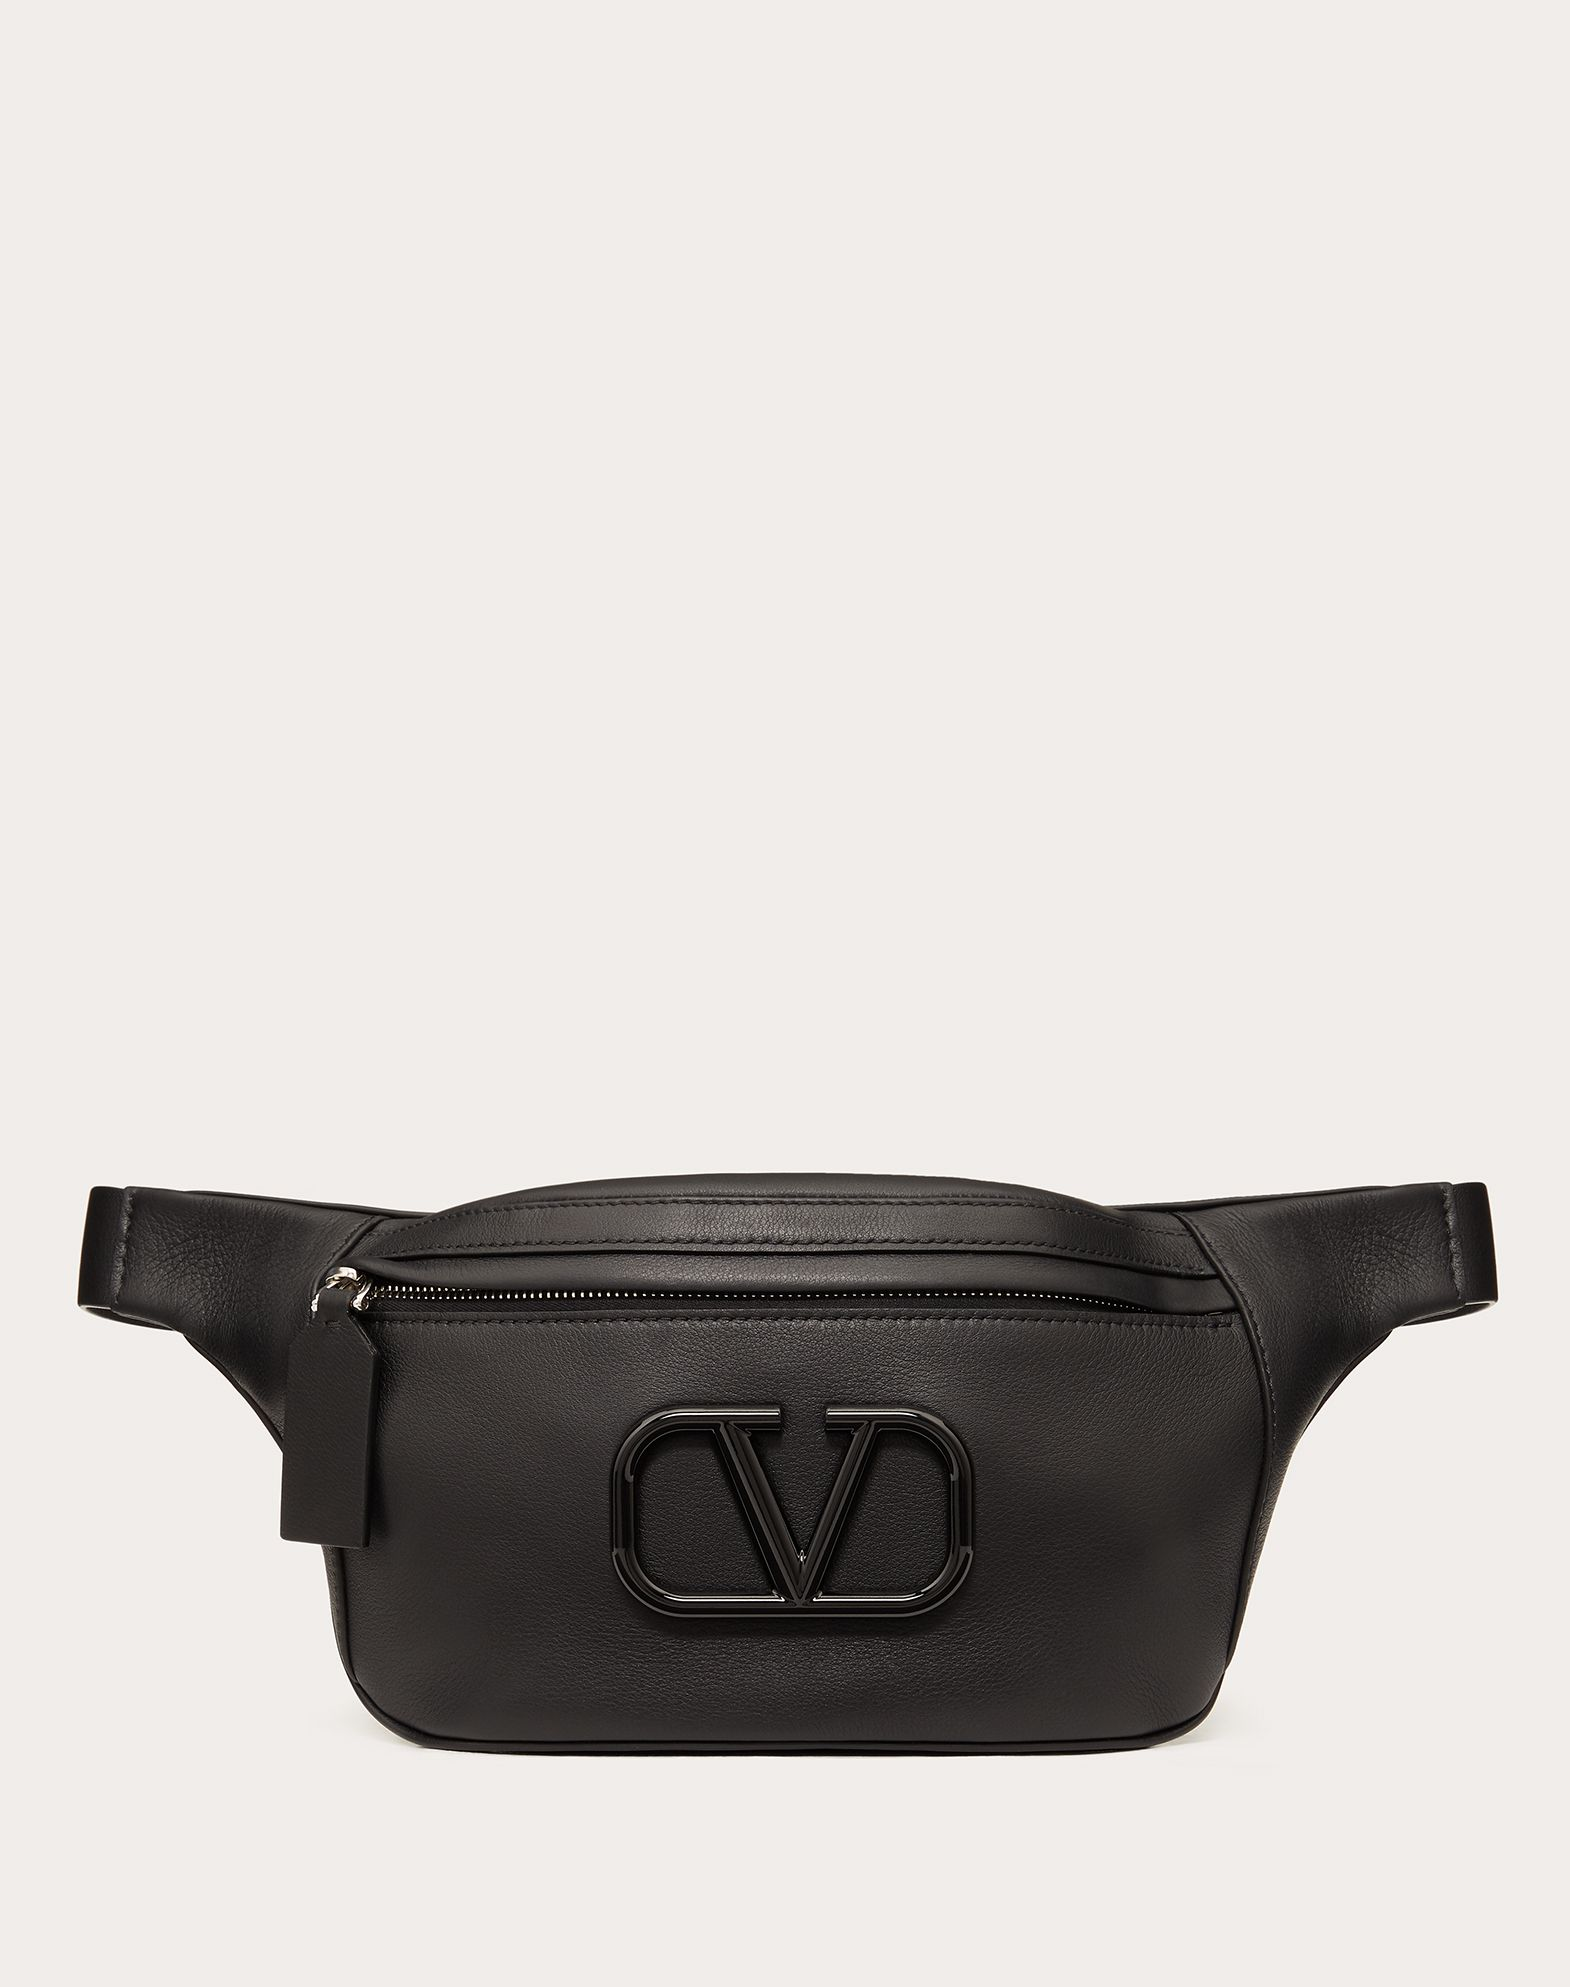 Small VLOGO Nappa Calfskin Belt Bag